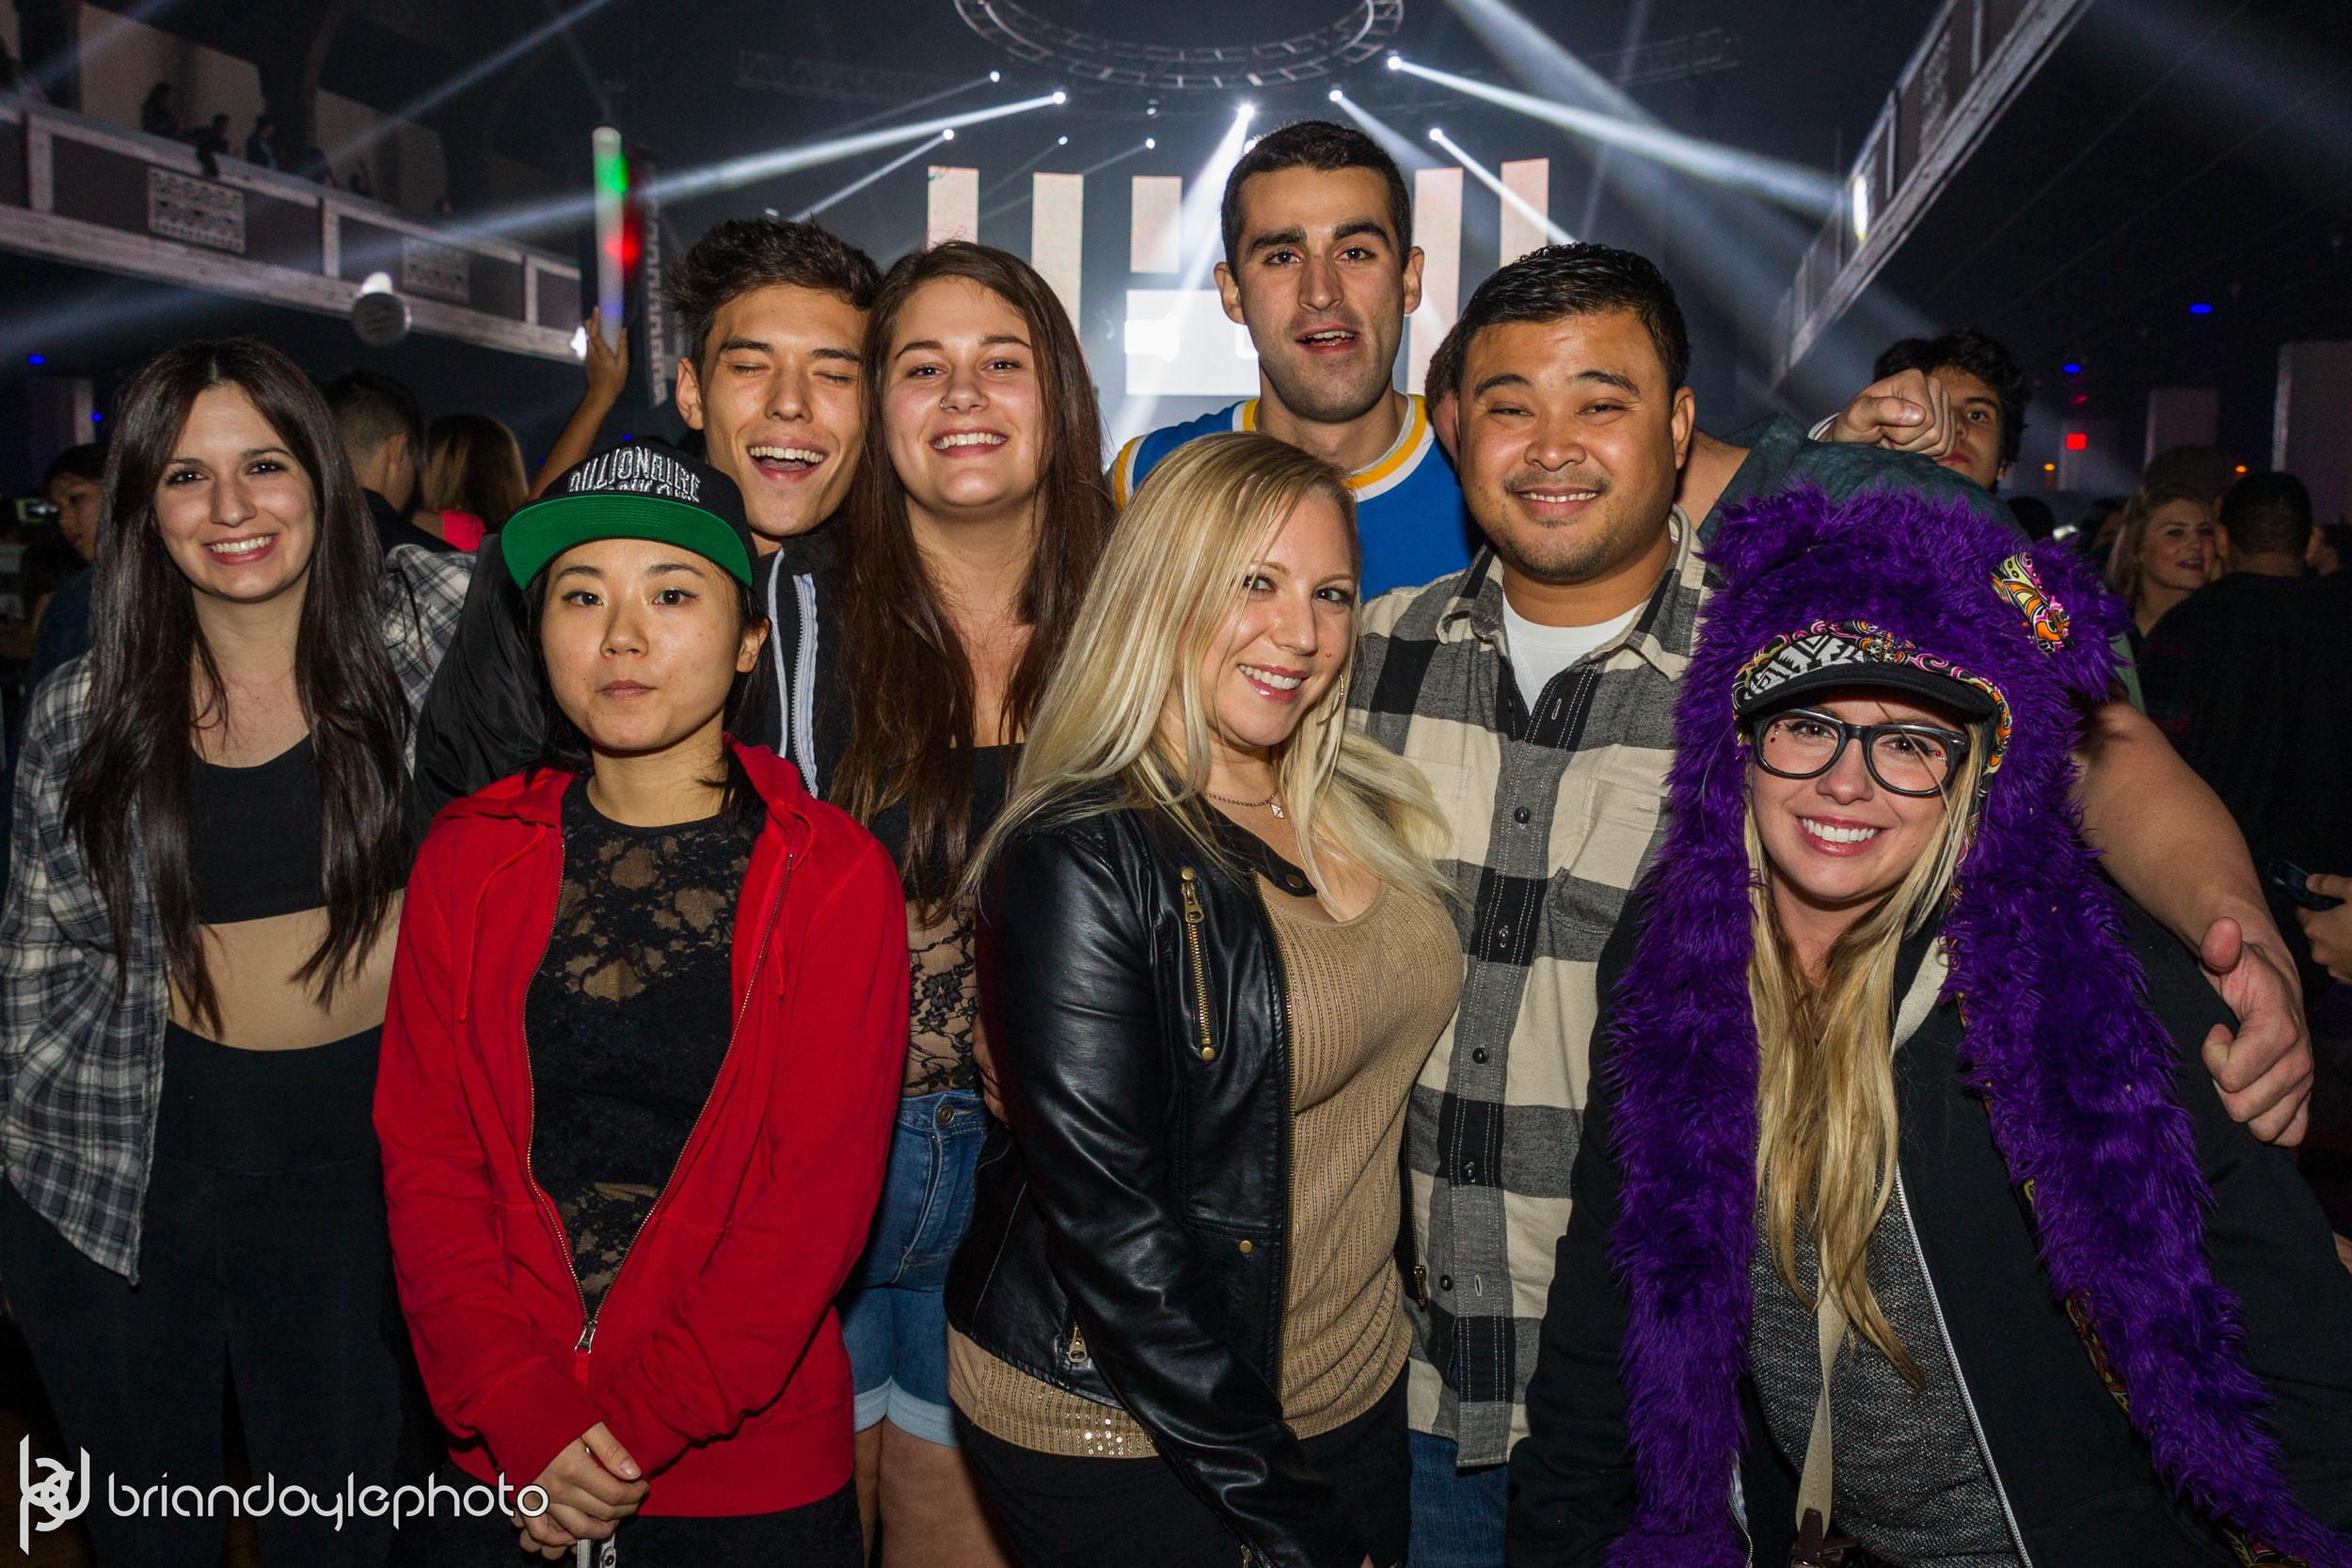 OMFG NYE 2015 LA - Eric Prydz, Henry Fong, Alex Metric, Botnek, Anna Lunoe, Wiwek 2014.12.31-8103.jpg